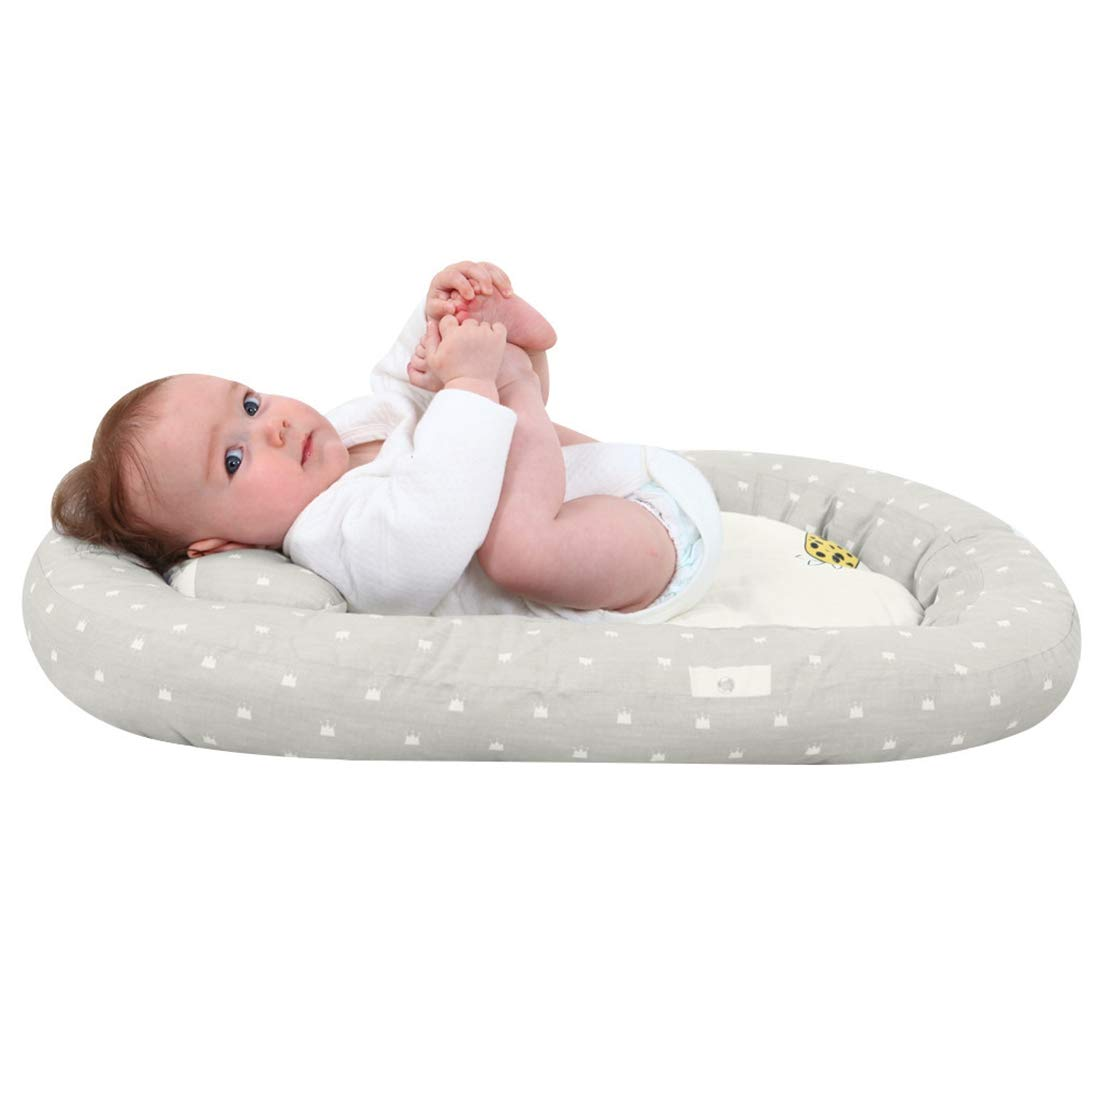 Baby Nest Reductor Protector Port/átil de Viaje Respirable Tumbona Cama para Dormir para Beb/és con Almohadilla Extra/íble Jiyaru Nido Cuna Suave para Beb/é